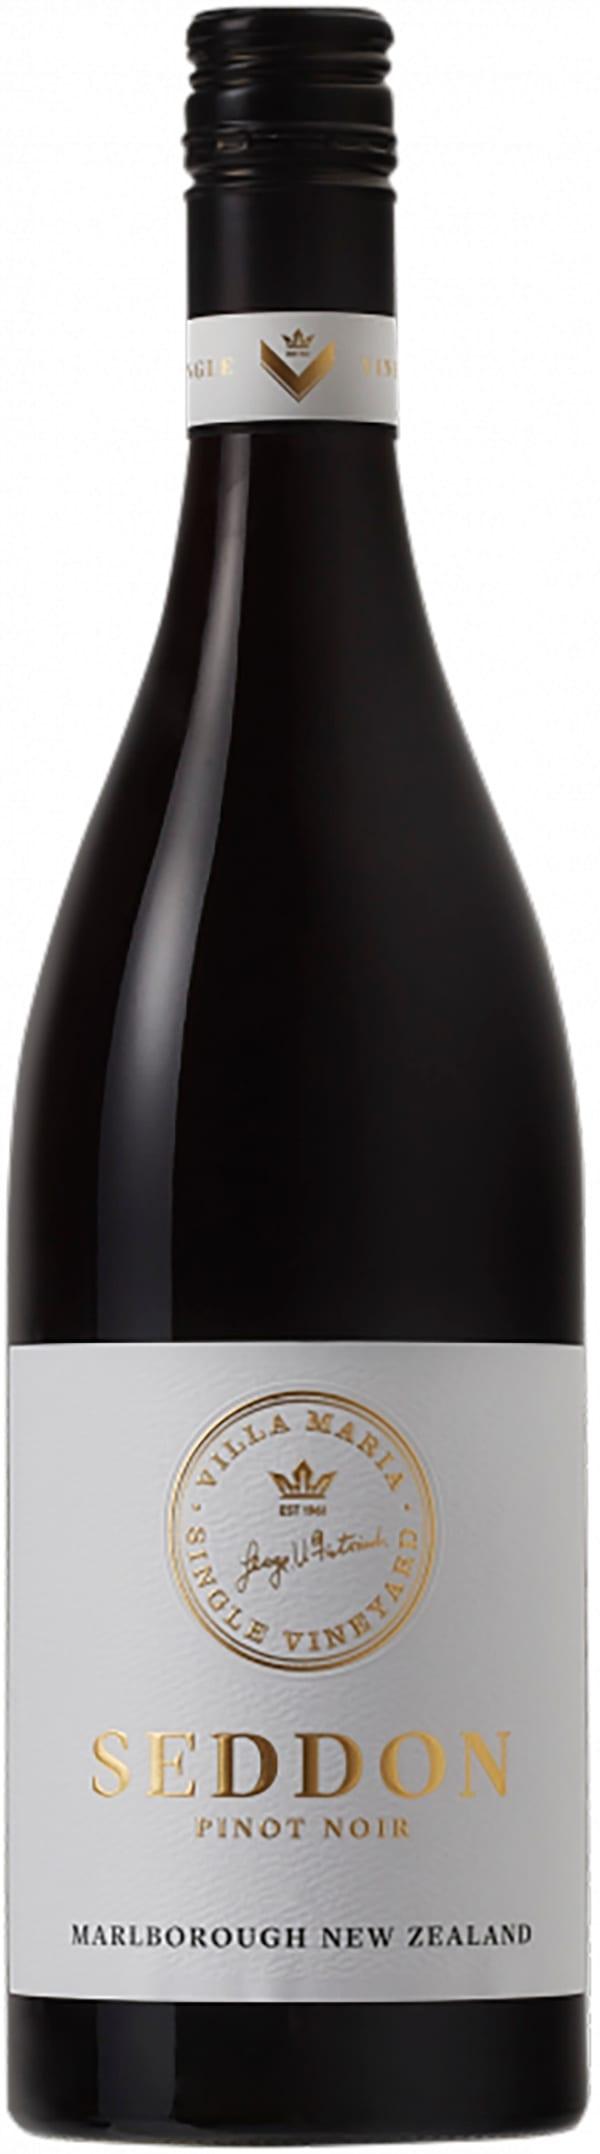 Villa Maria Seddon Vineyard Pinot Noir 2018